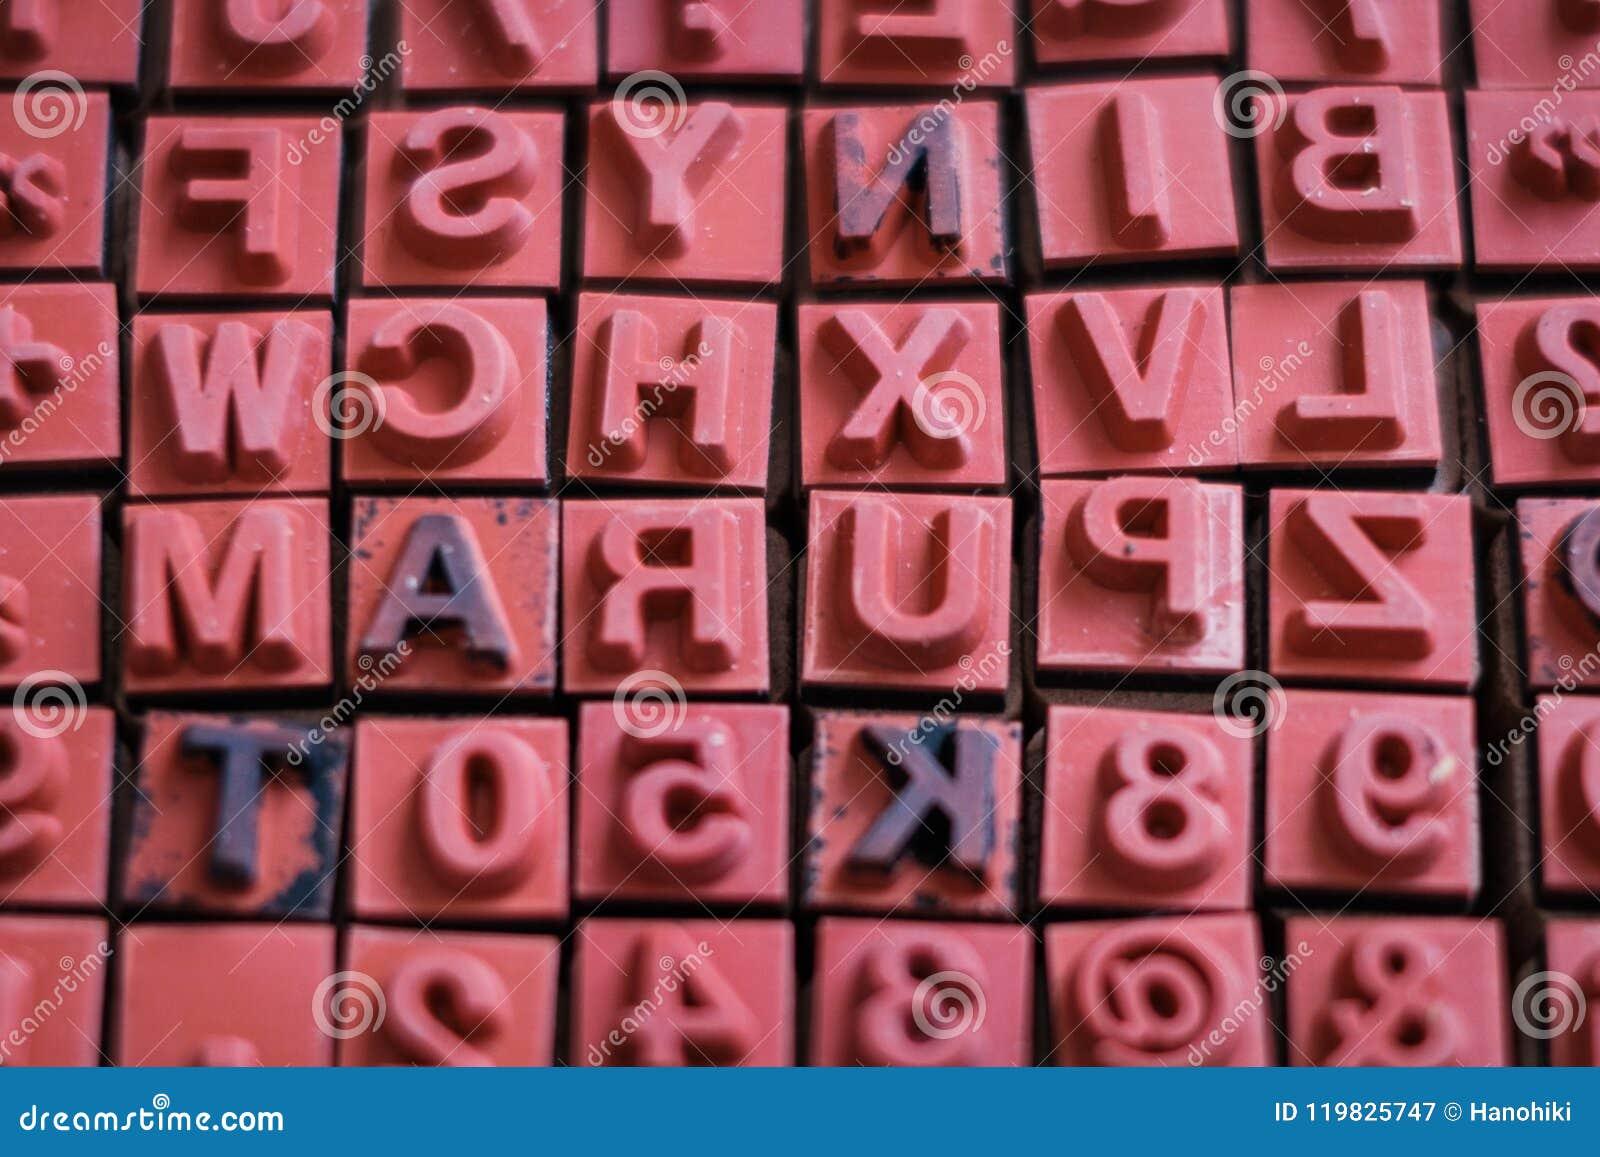 Letter and number stamps macro - alphabet letterpress ,